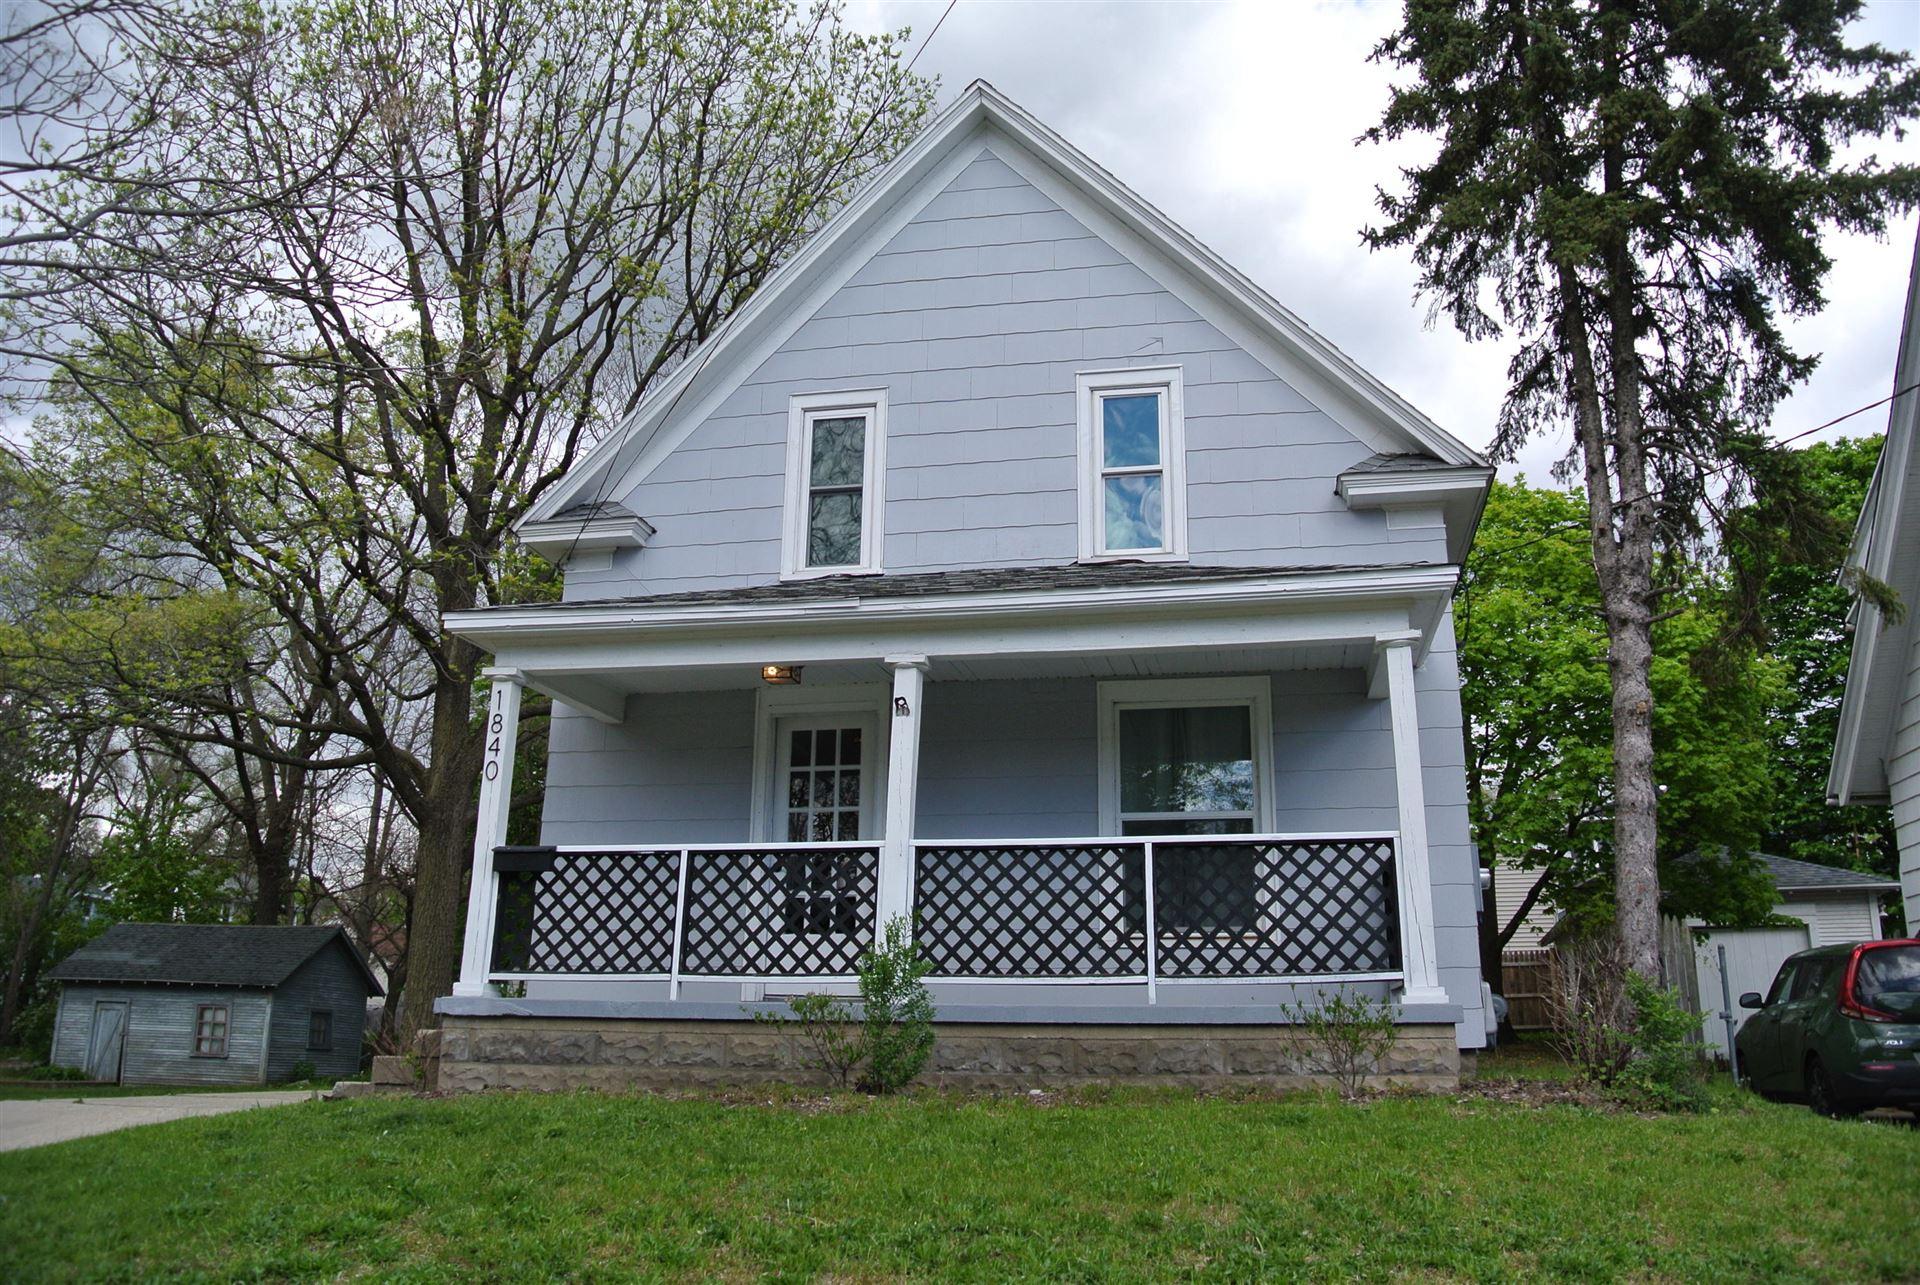 1840 Eastern Avenue SE, Grand Rapids, MI 49507 - MLS#: 21016342